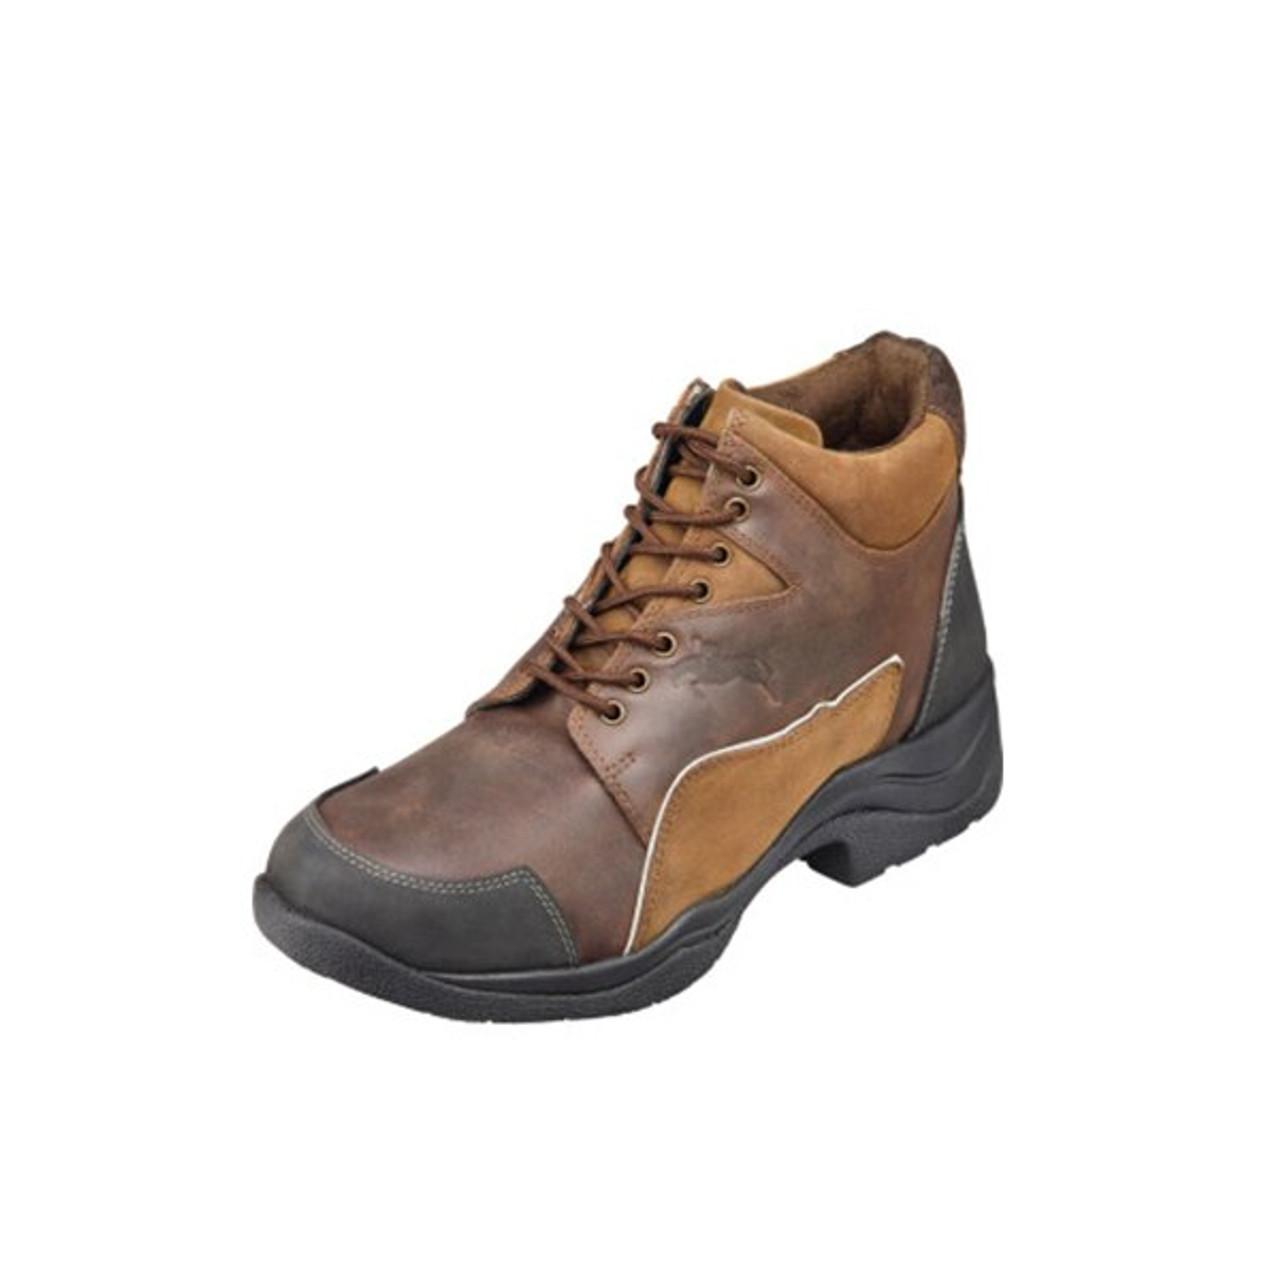 3225eddc5e5 Harry Hall AW17 Outland Endurance Short Boots - Brown